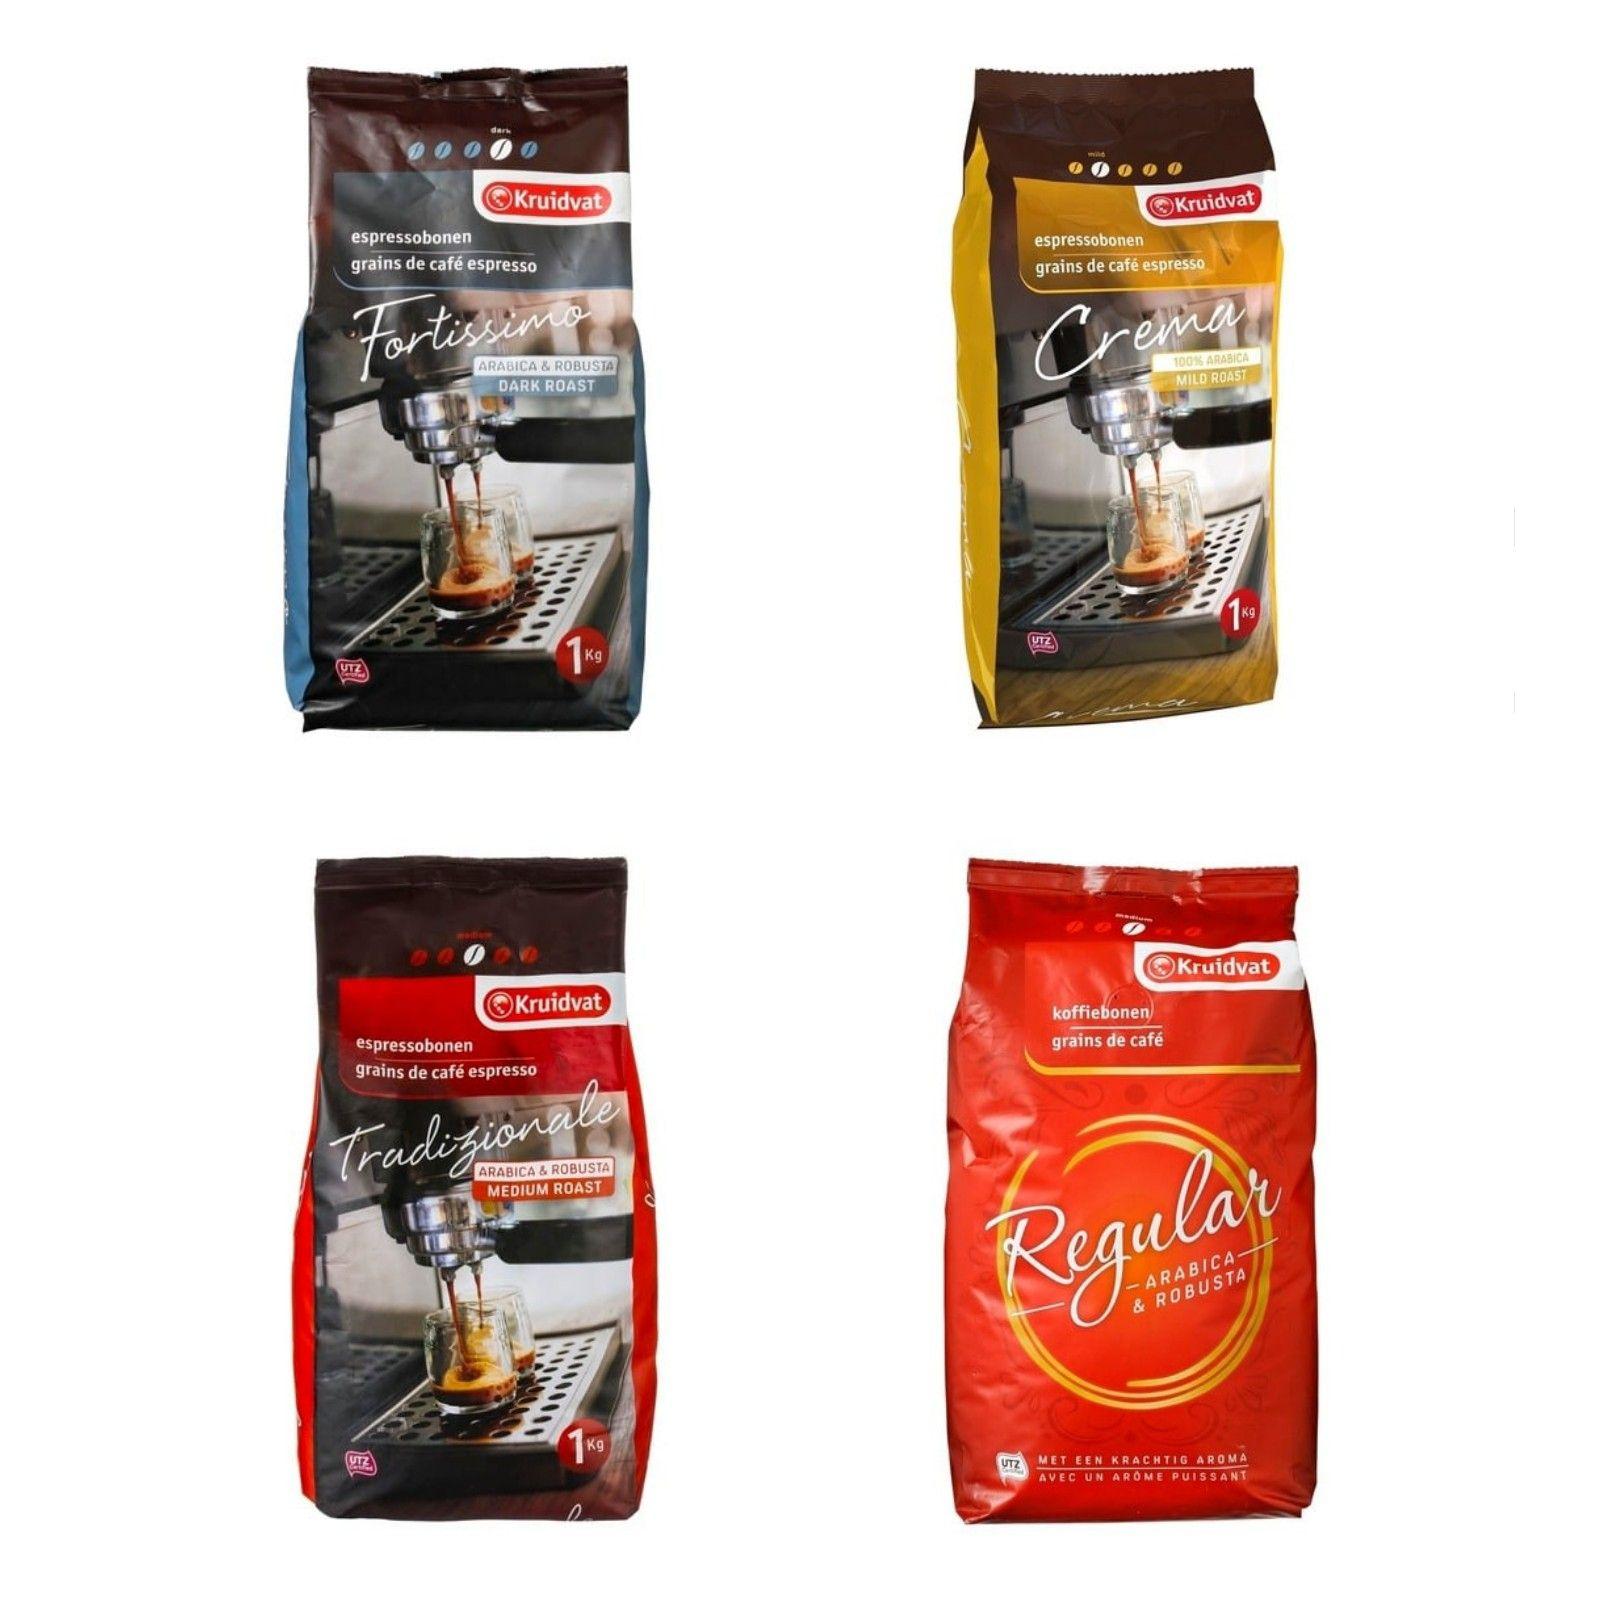 Kruidvat koffiebonen 2 kg voor €10 (i.p.v. €14,38) of met 100 punten €9 @Kruidvat